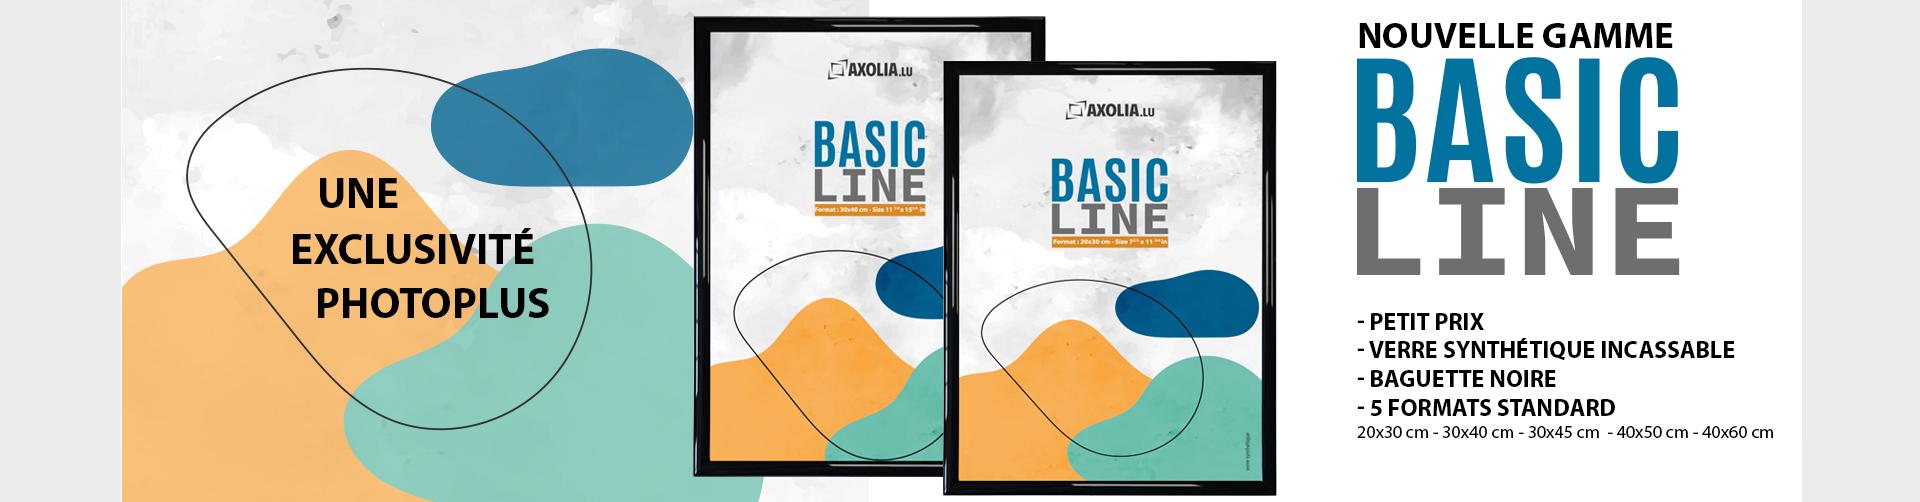 Nouvelle gamme Basic Line